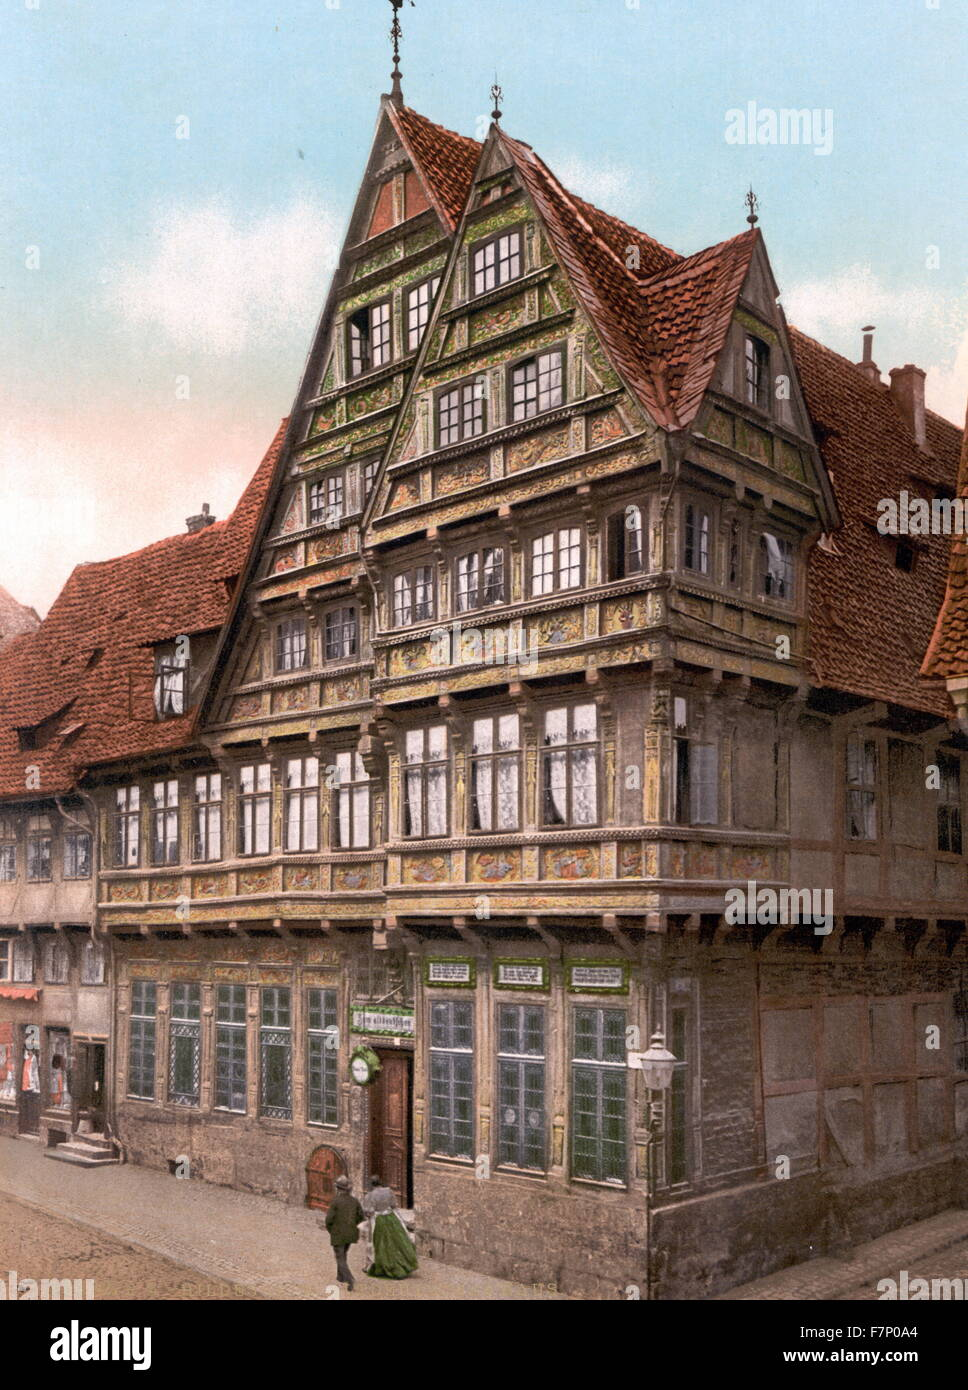 Casa antigua, Hildesheim, Hannover, Alemania 1890 Imagen De Stock